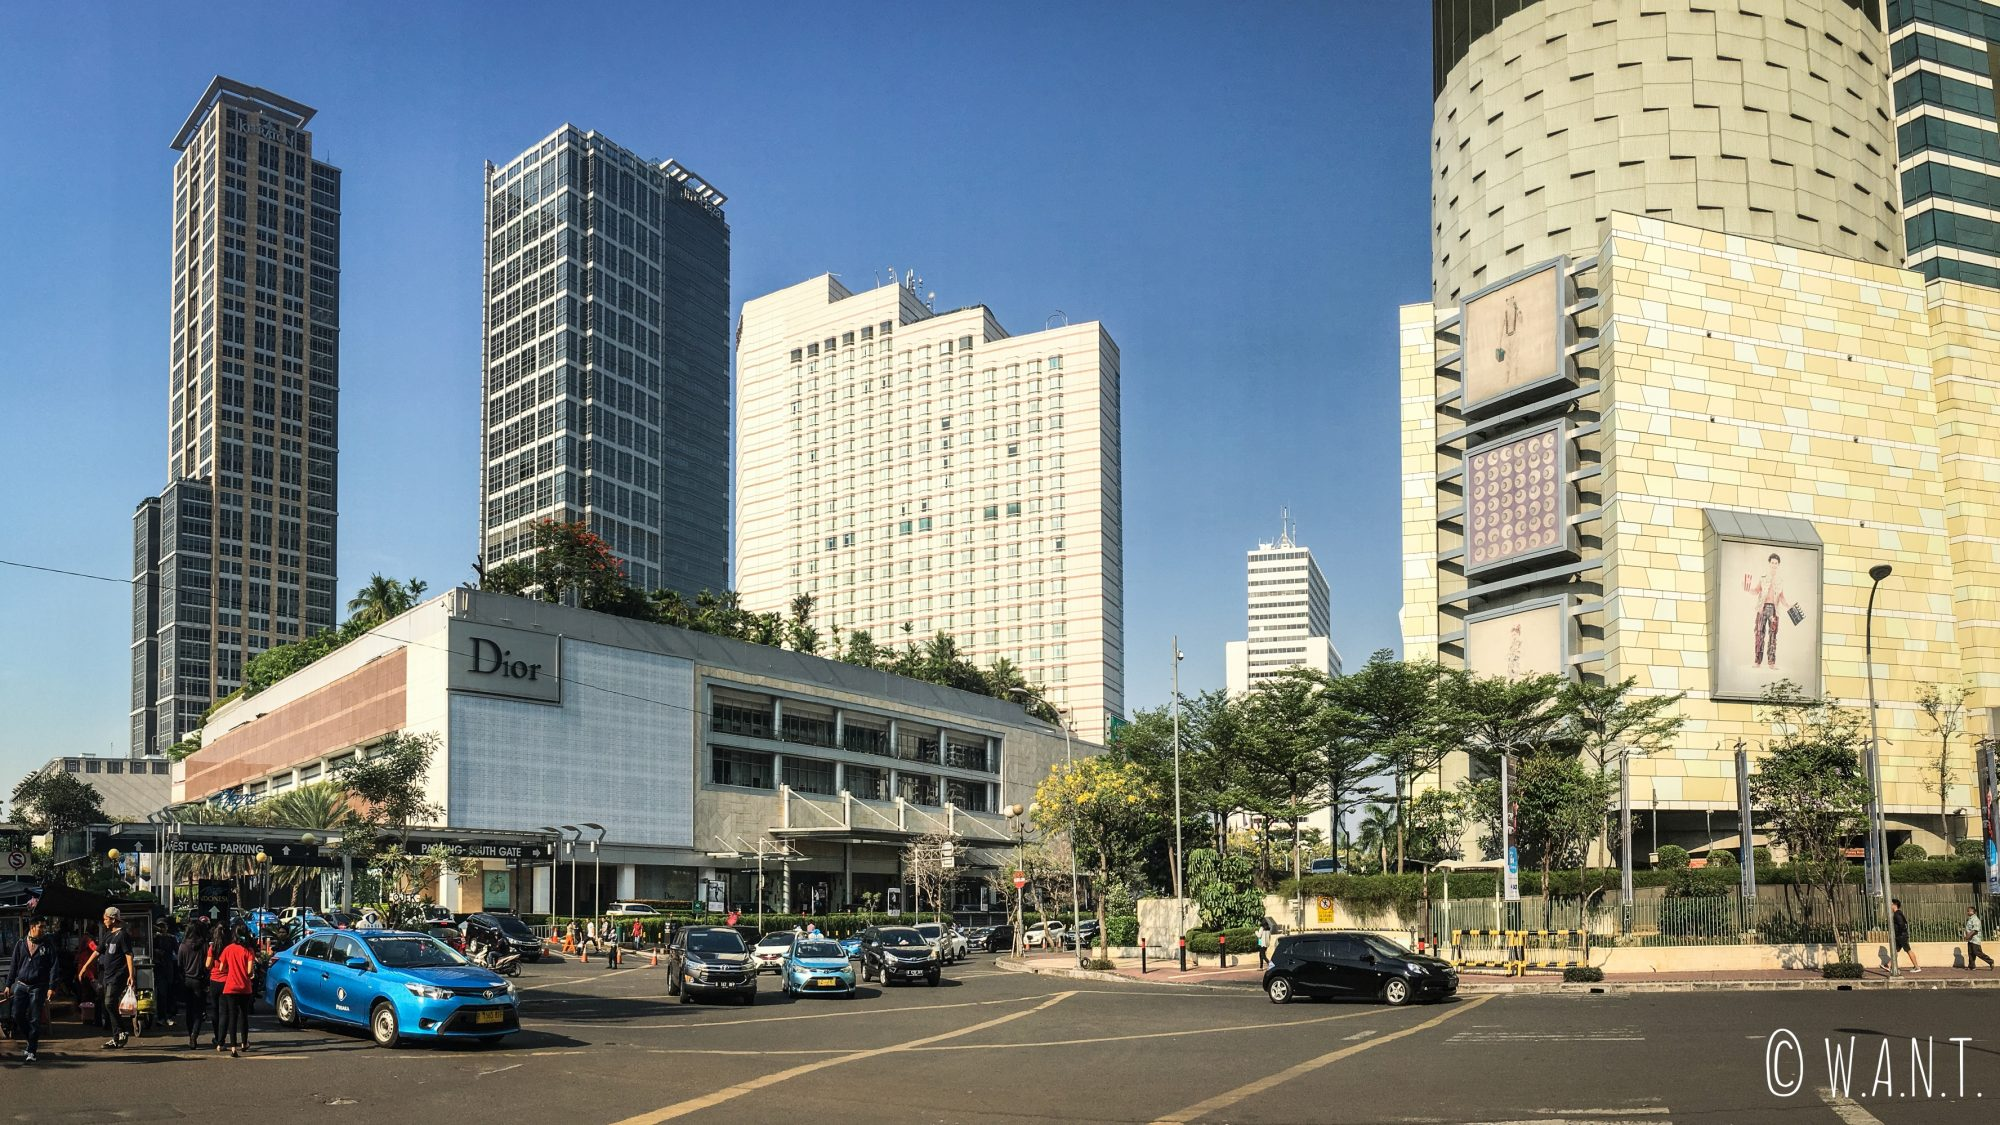 Vue au pied du Grand Mall Indonesia de Jakarta